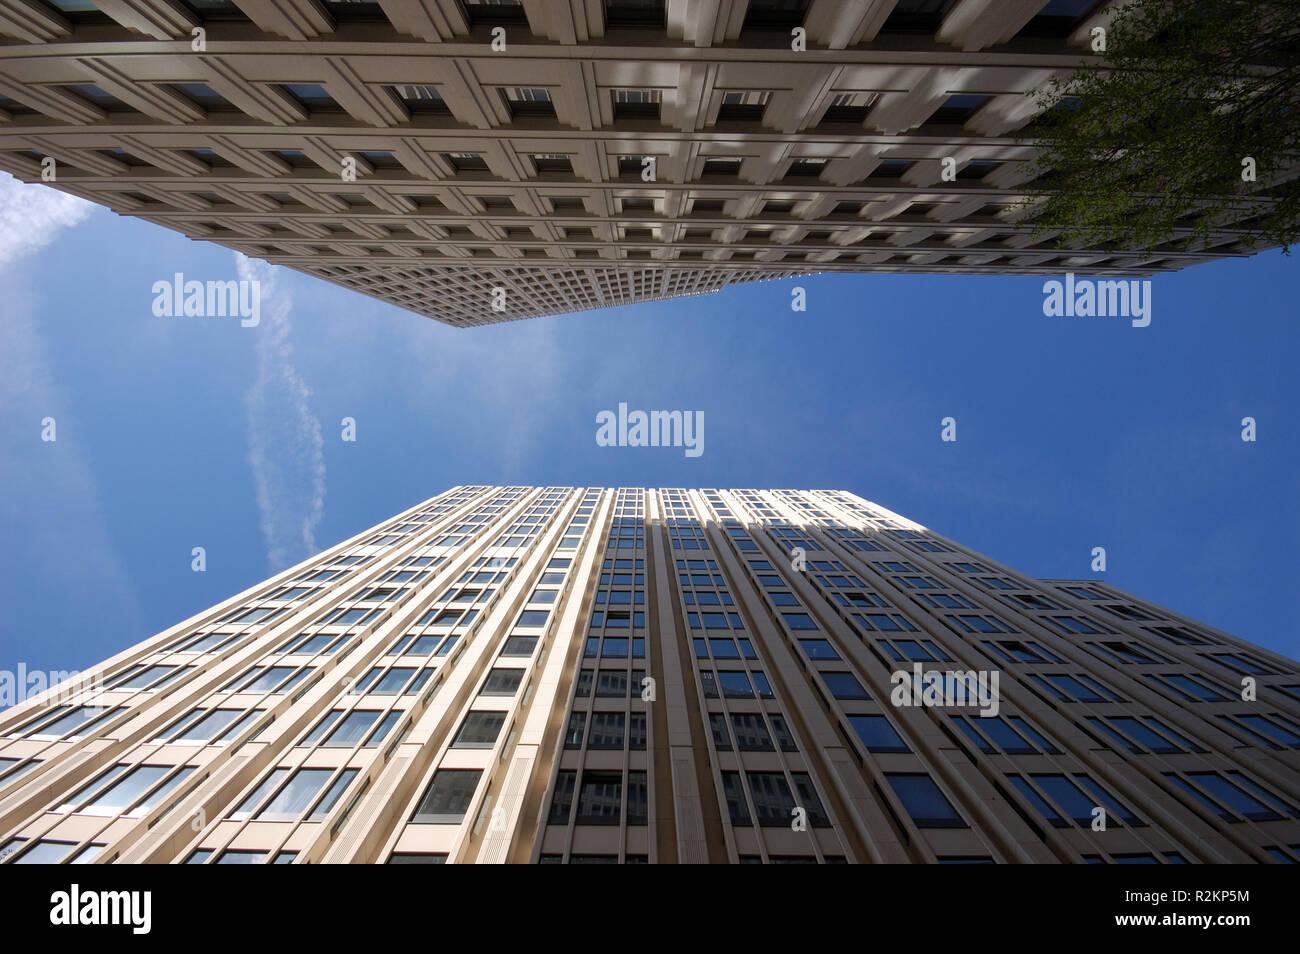 skyscrapers on potsdamer platz in berlin Stock Photo